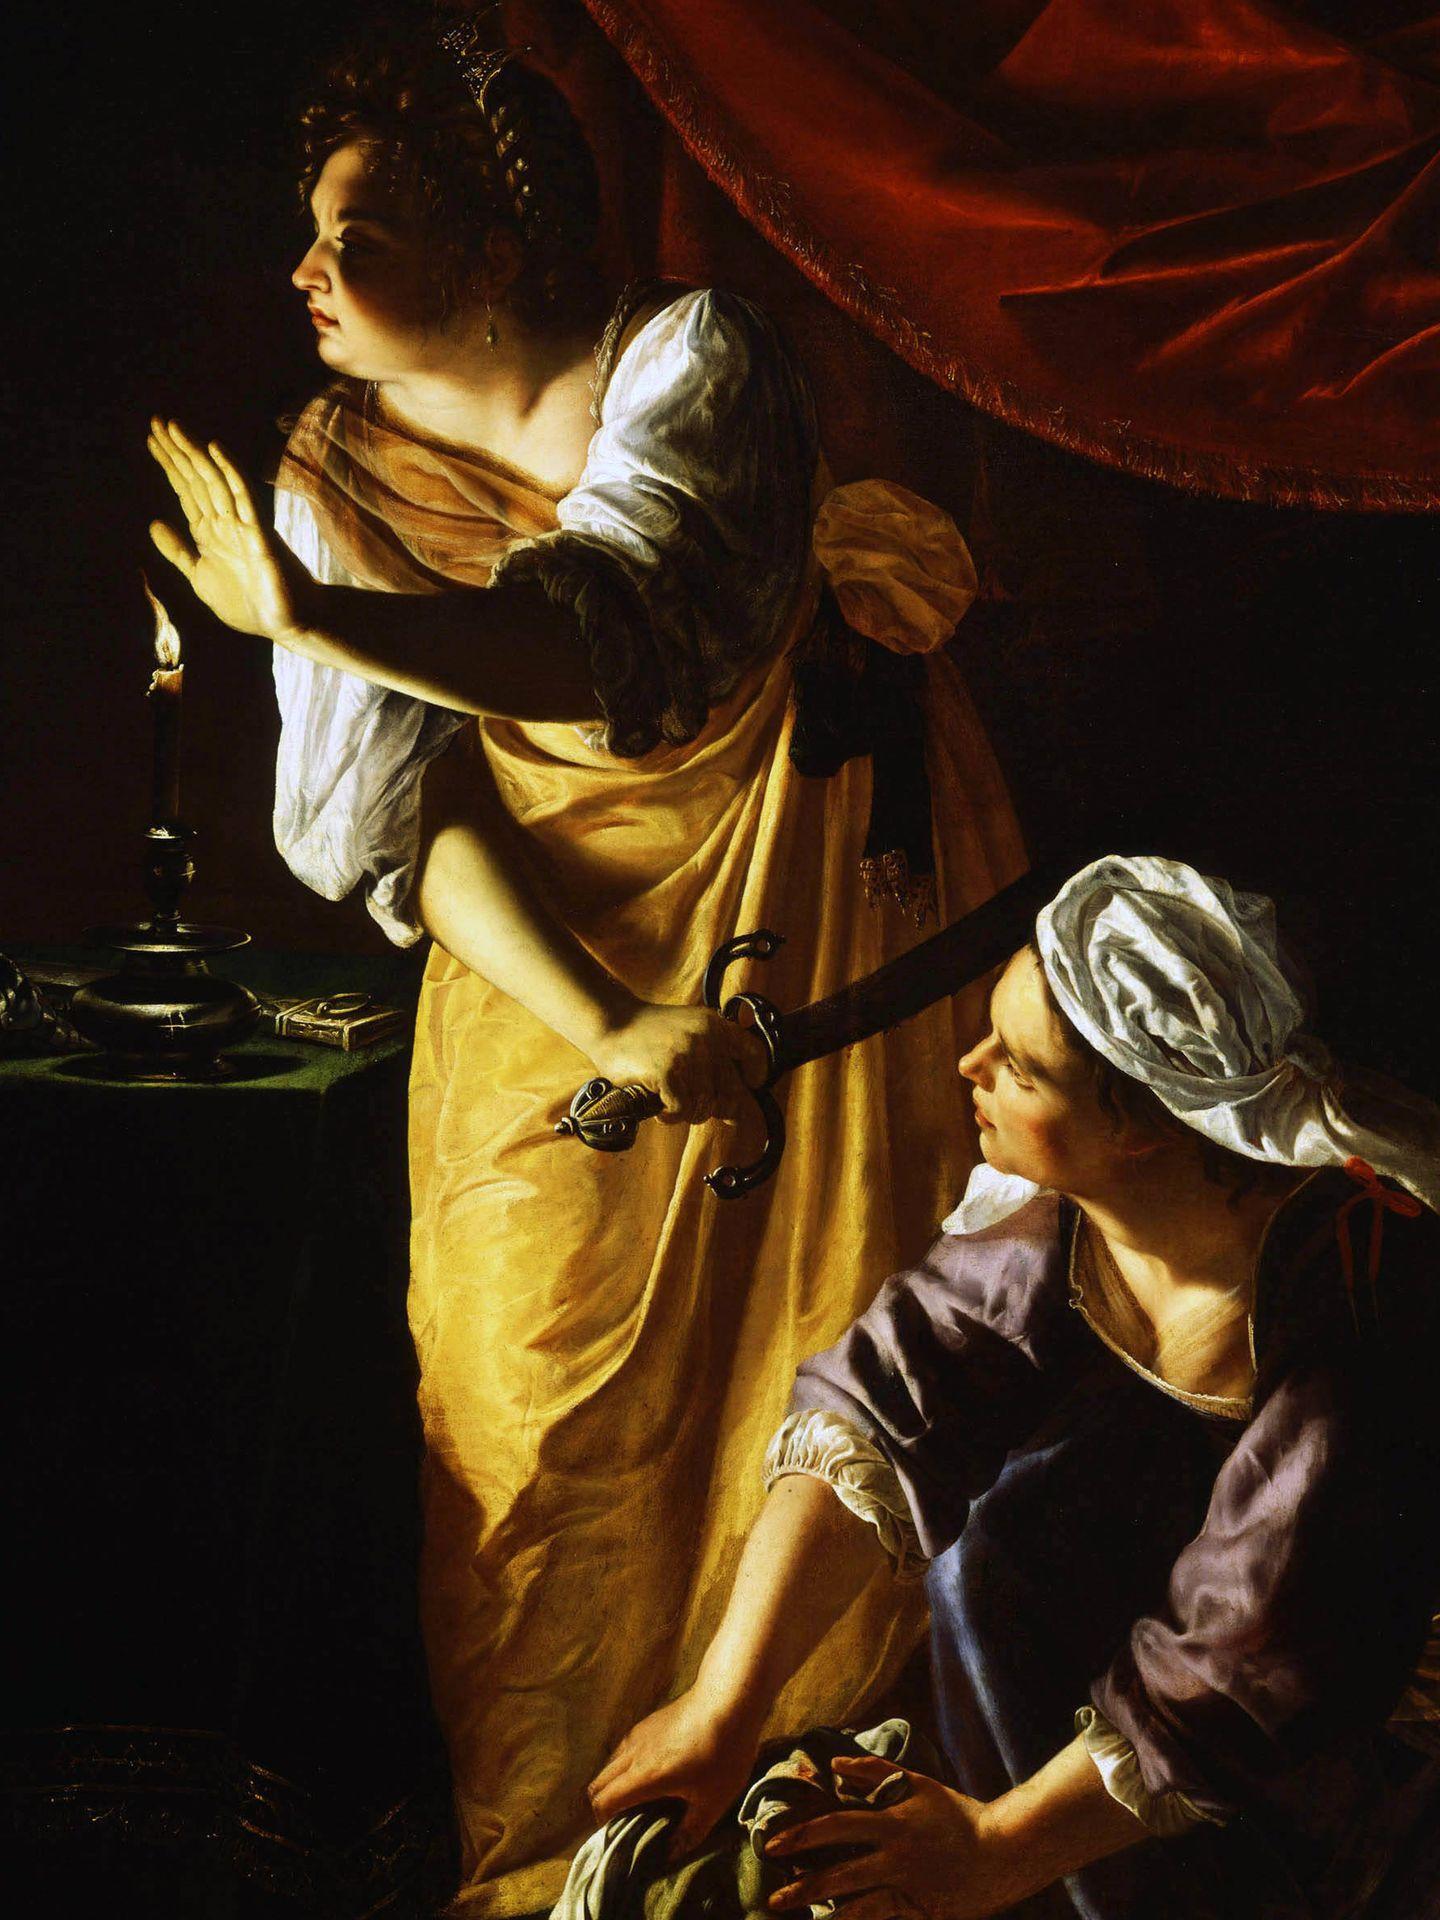 'Judit y su doncella', Artemisia Gentileschi, 1623-25. Detroit Institute of Arts.